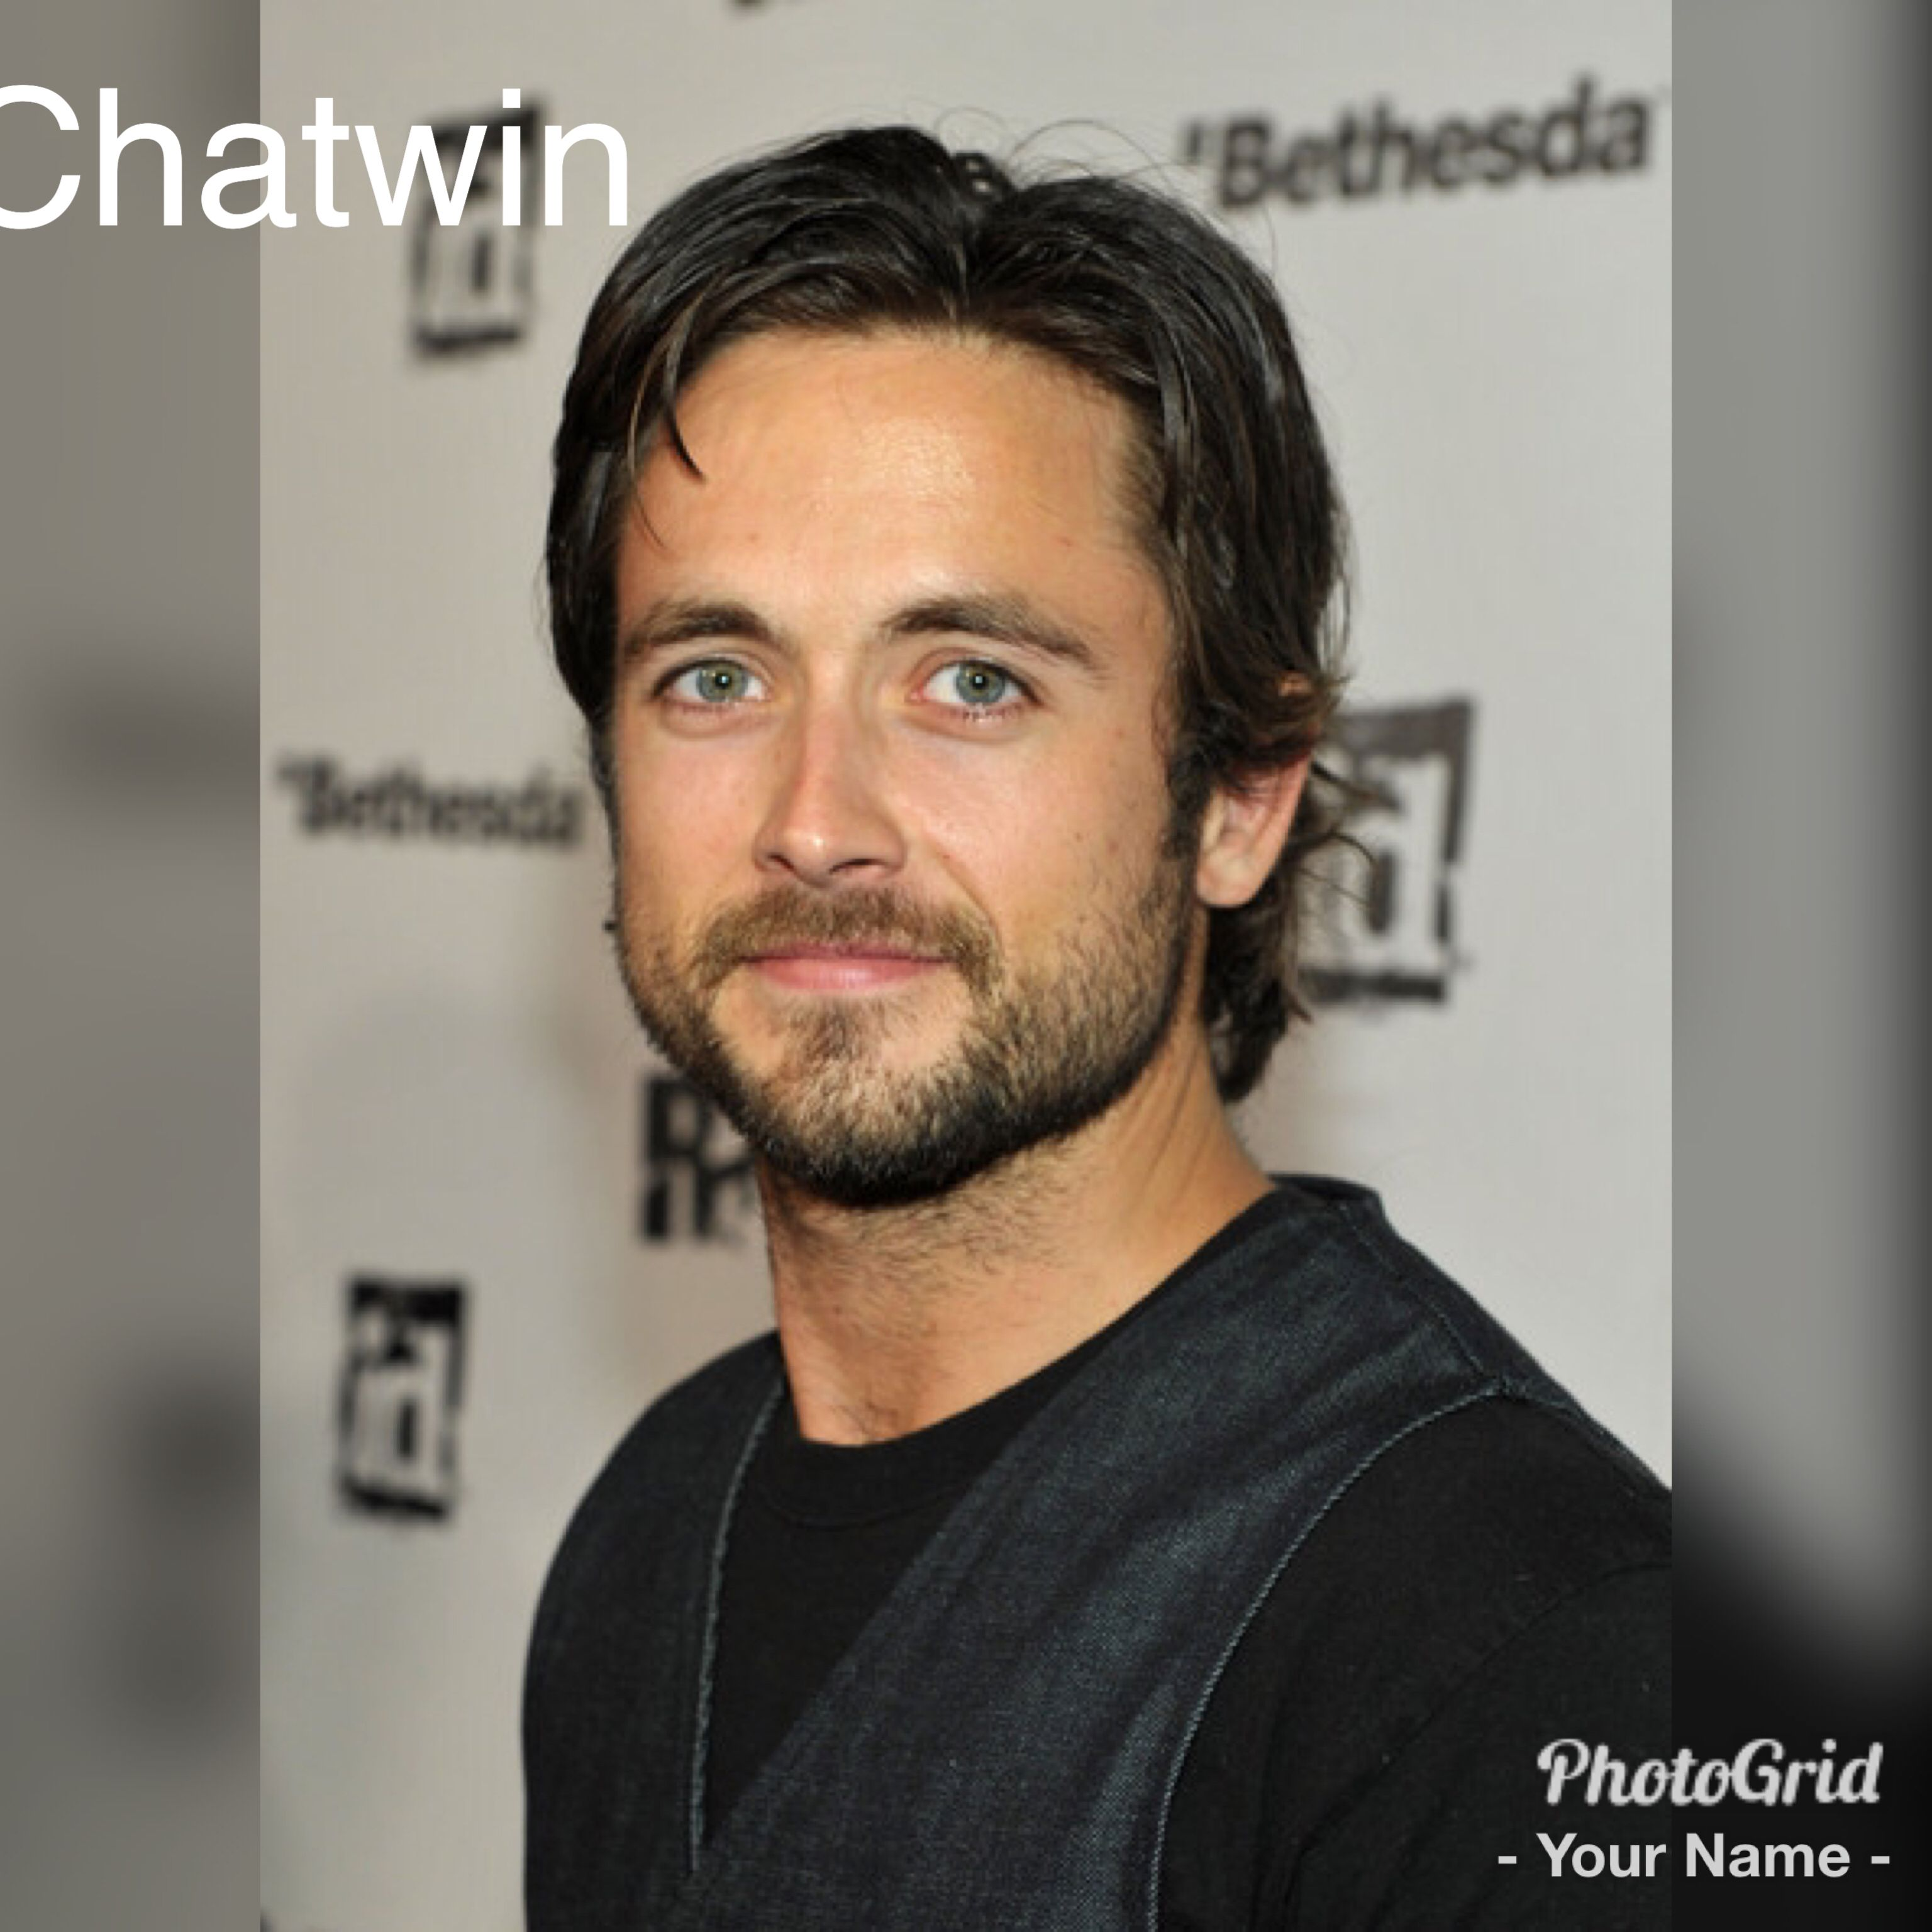 justin chatwin..shameless | sigh | justin chatwin, man